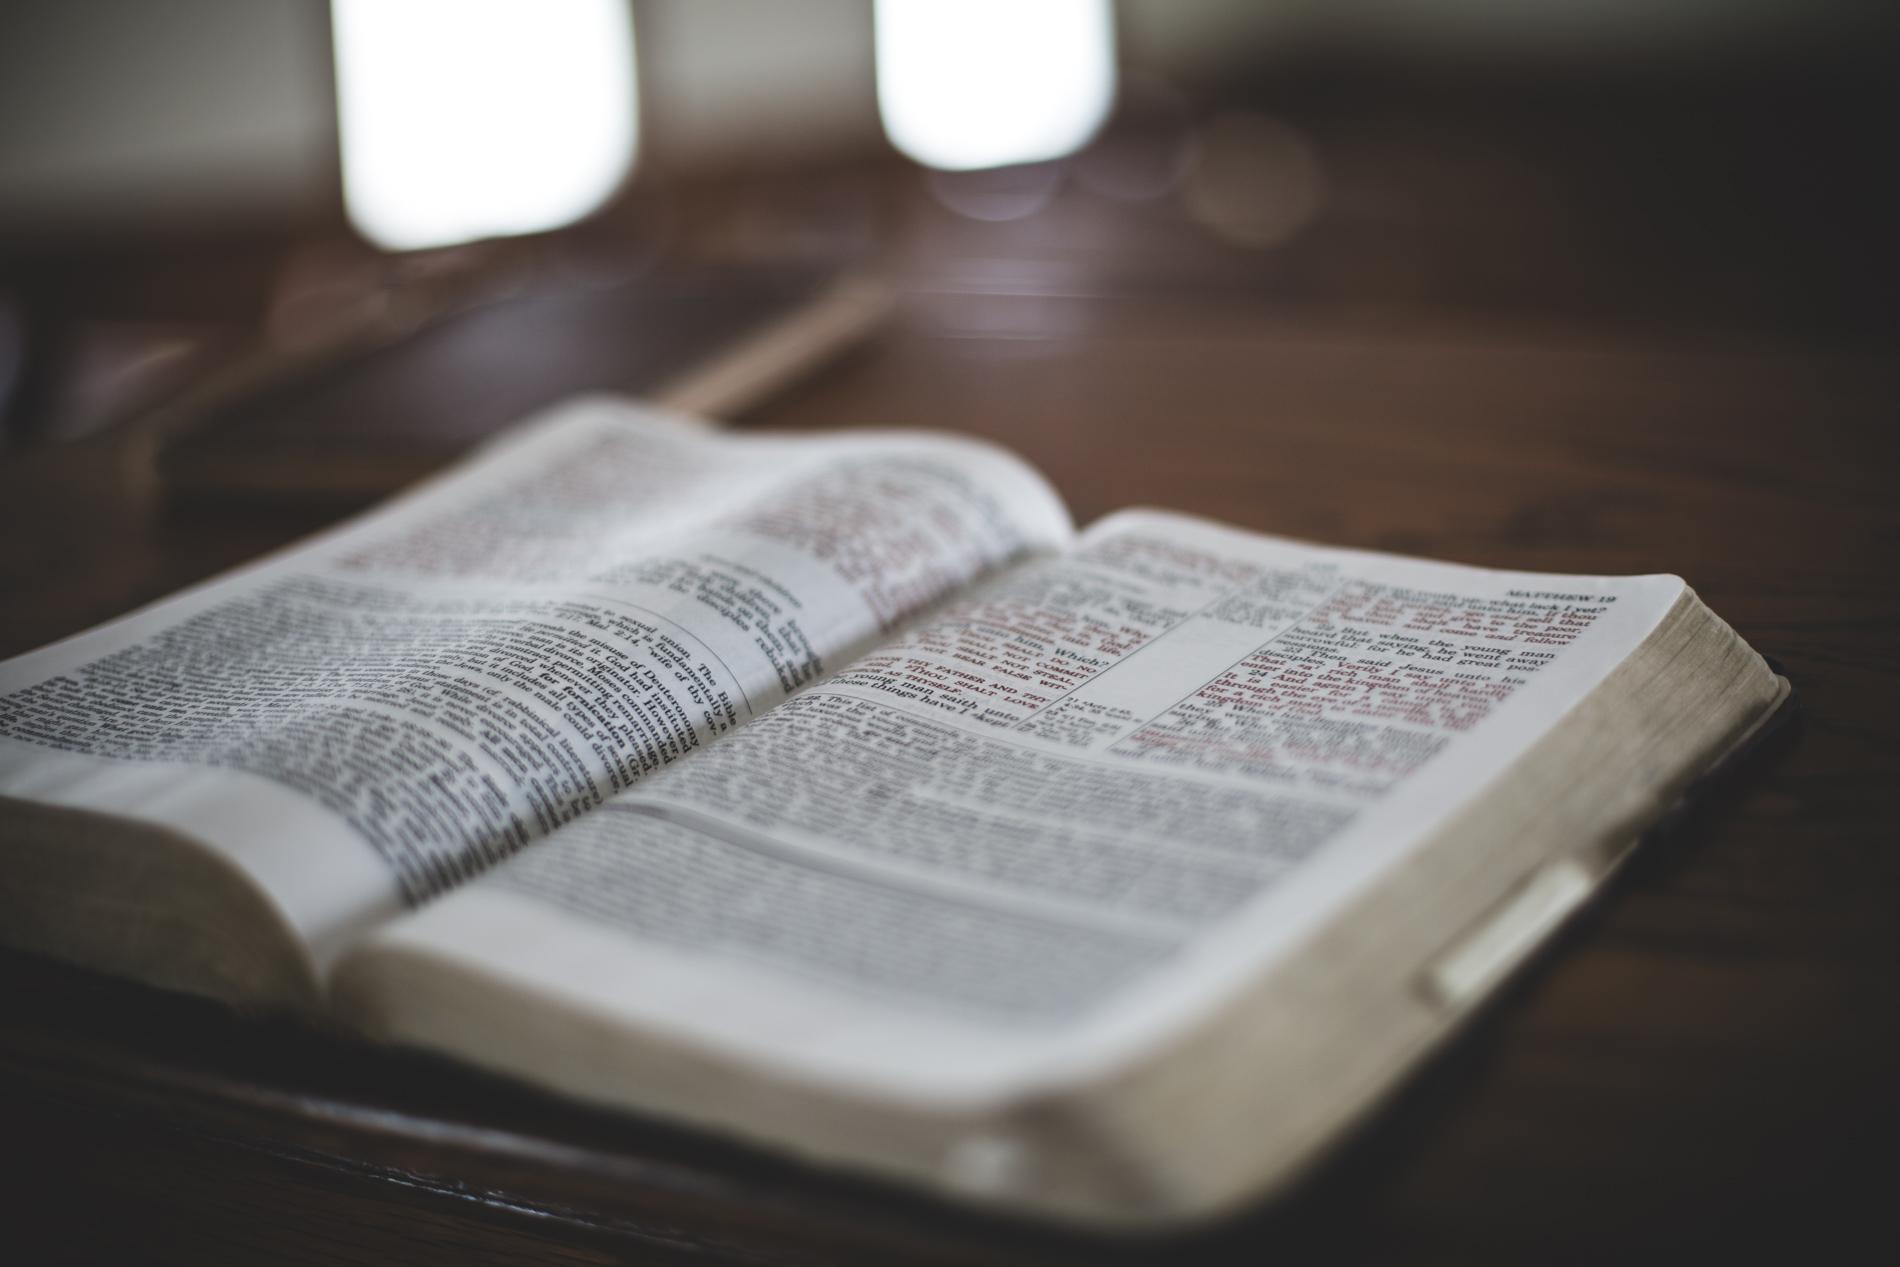 neuestock-bible-on-pulpit.jpg